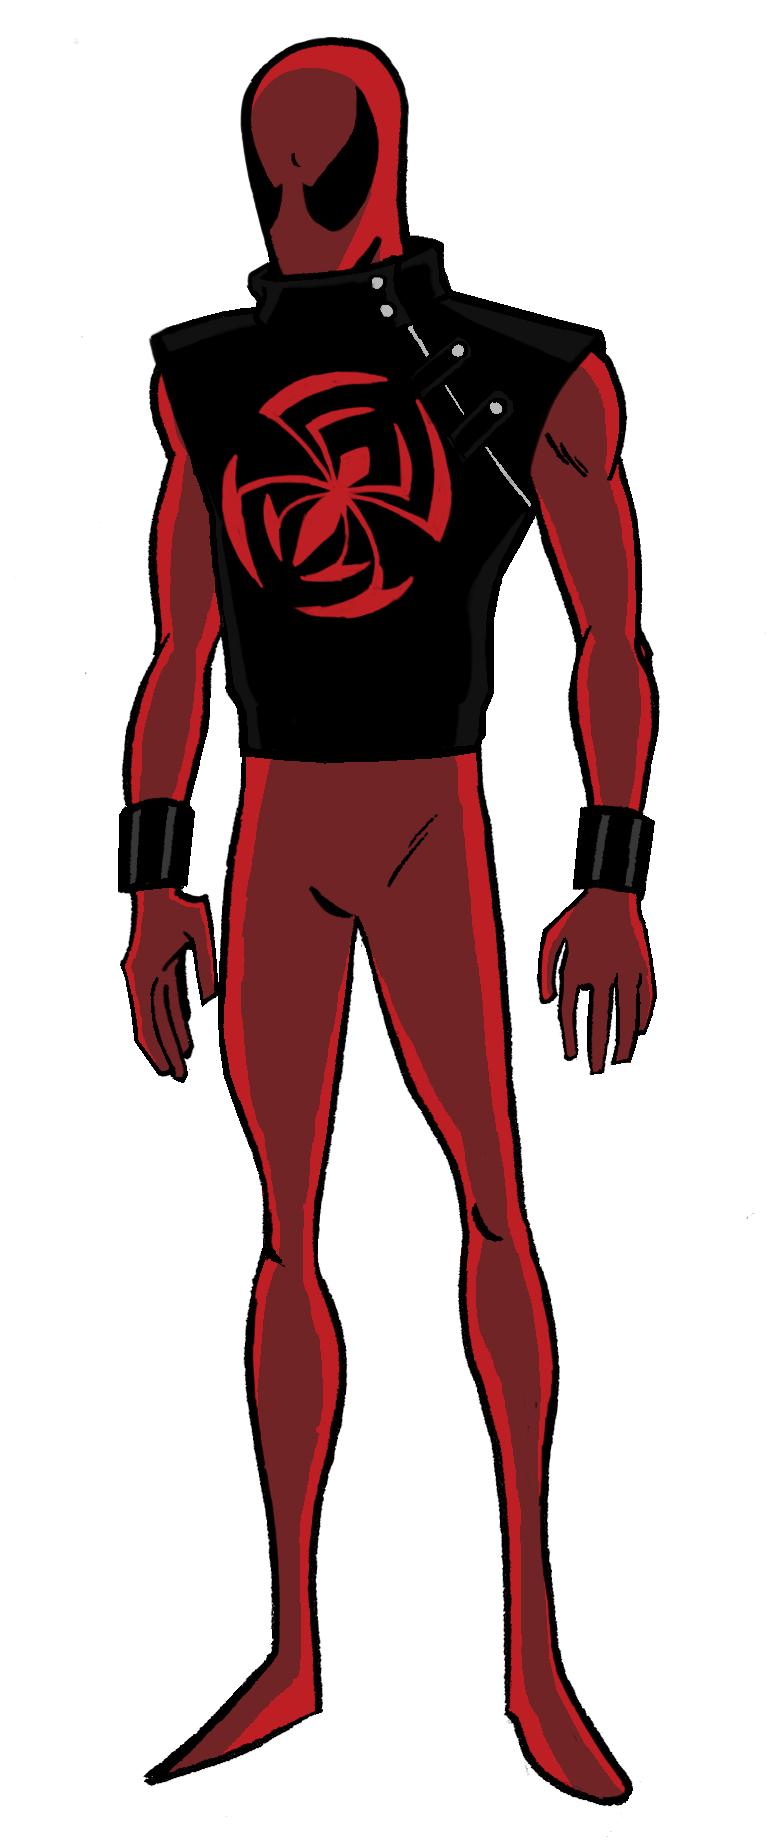 Scarlet Spider   Scarlet spider, Spider cartoon, Spider